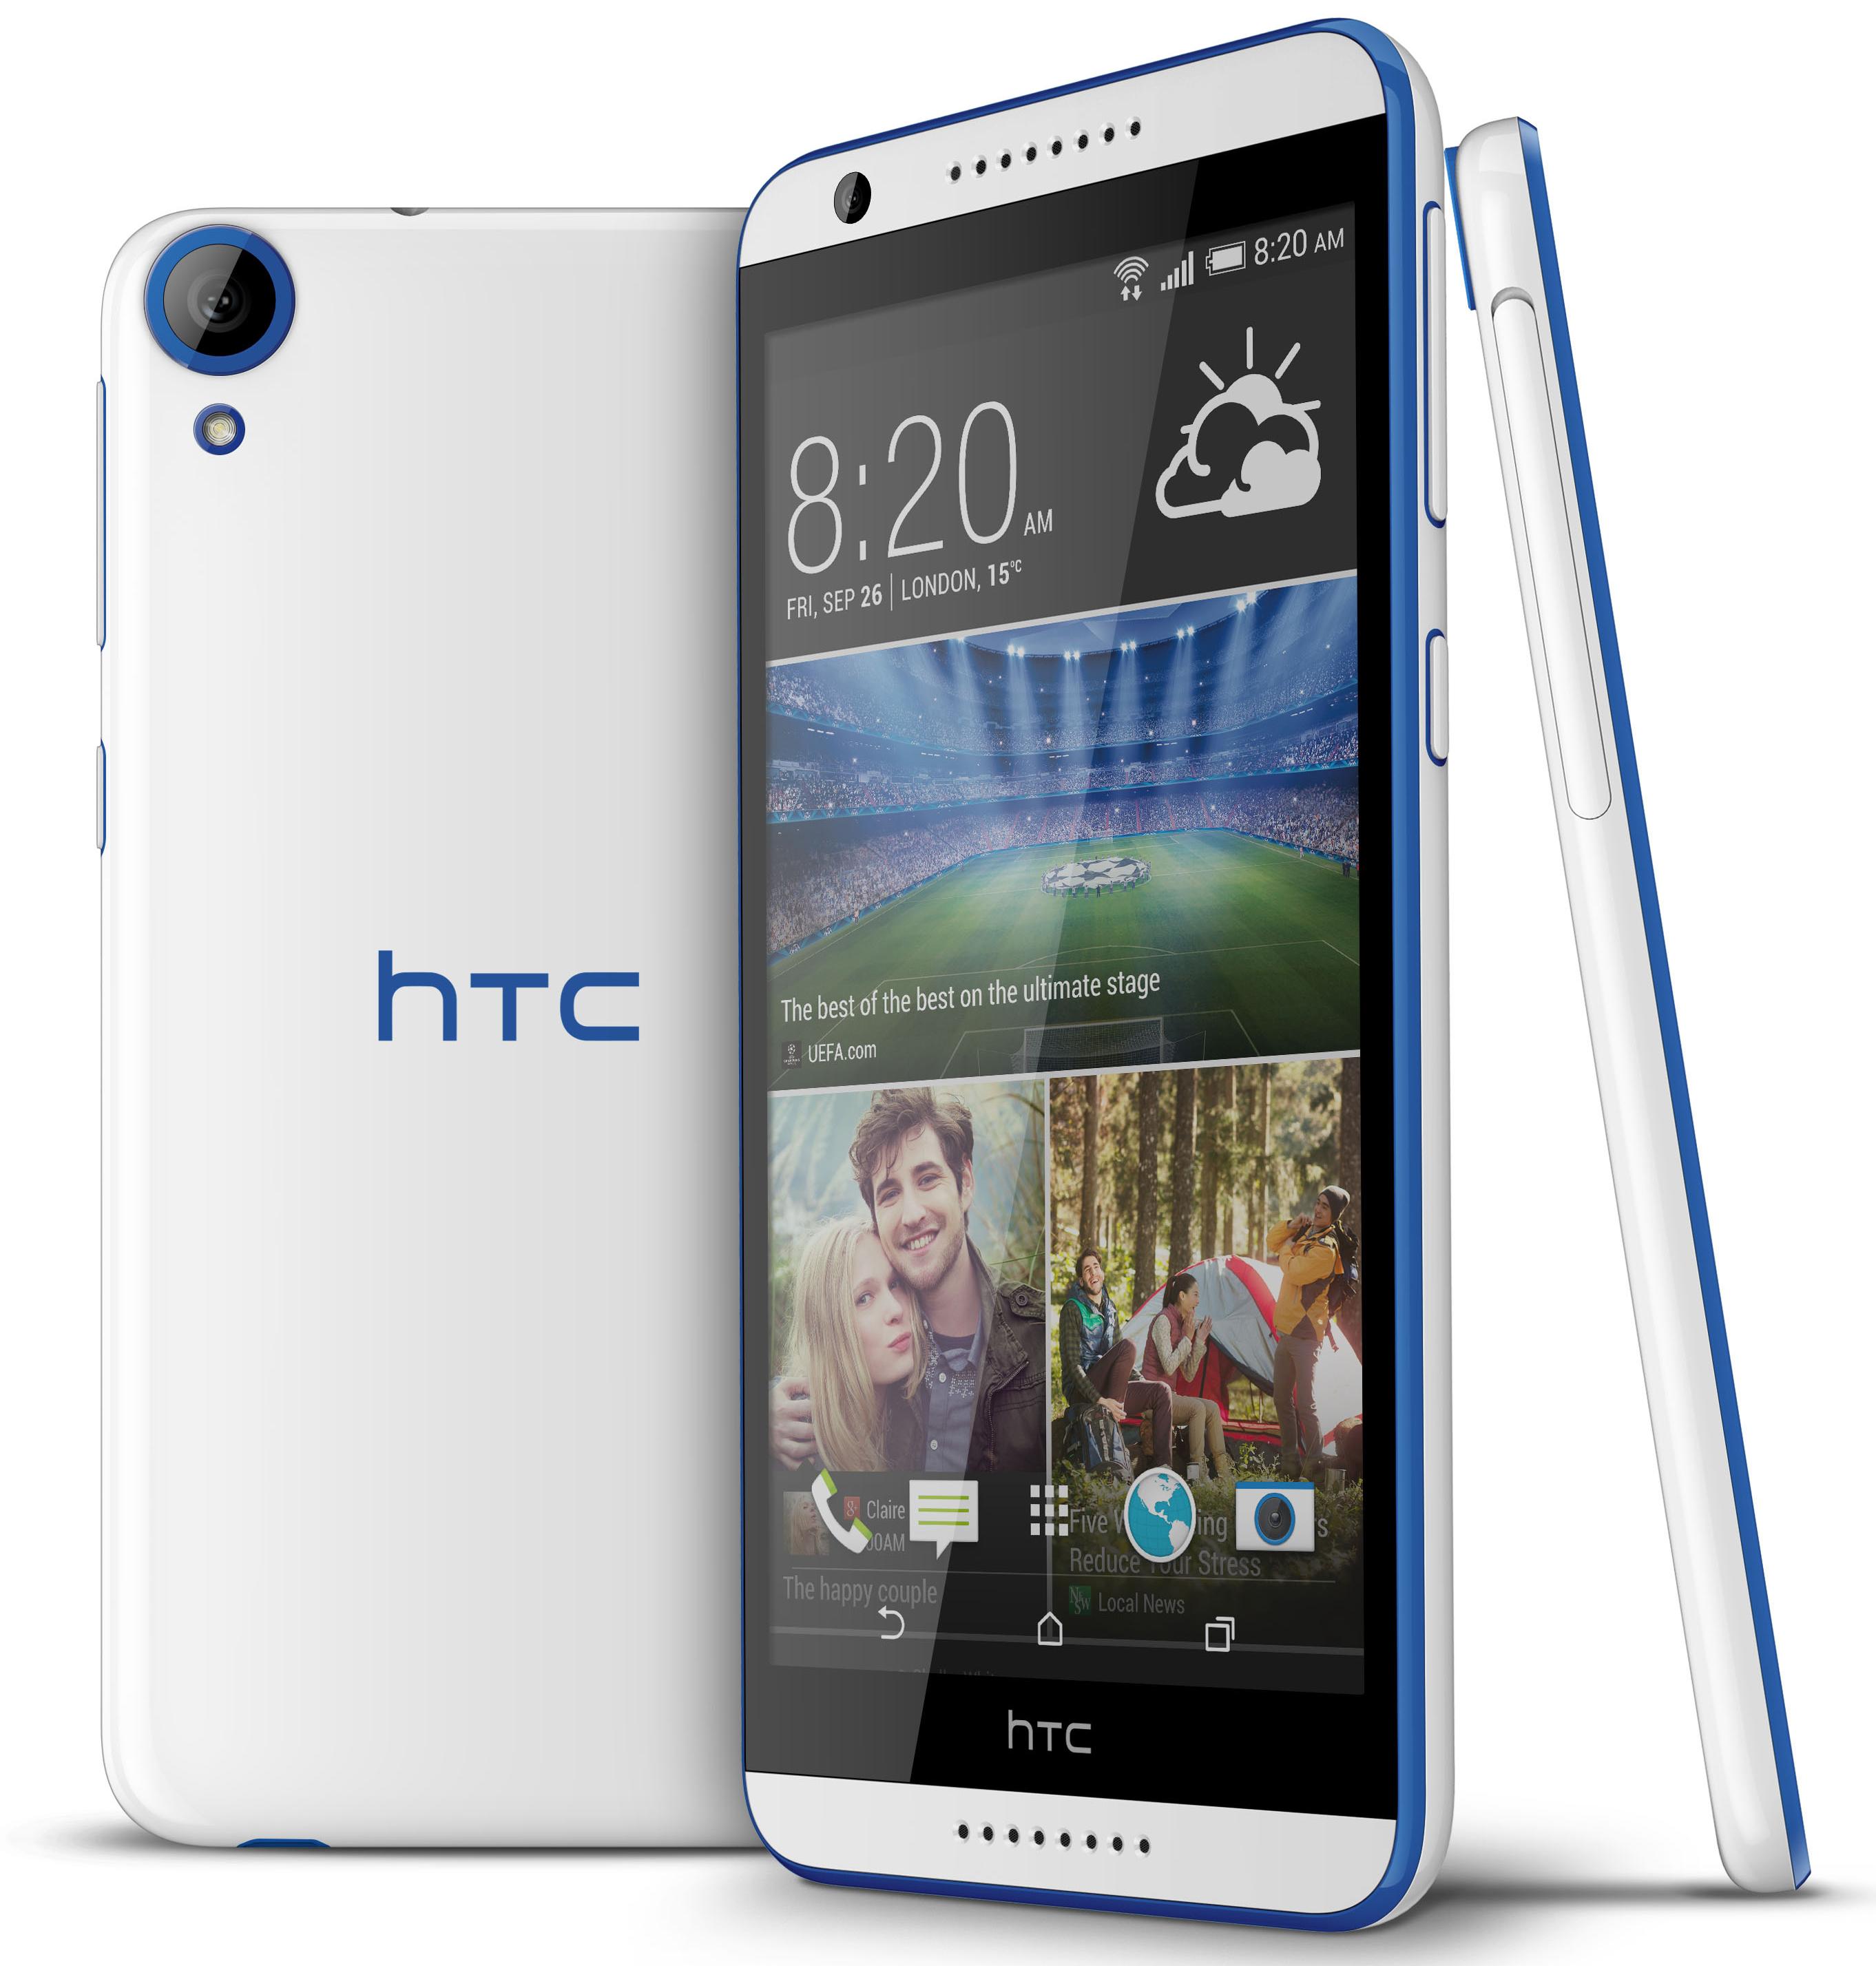 HTC Announces the Desire 820